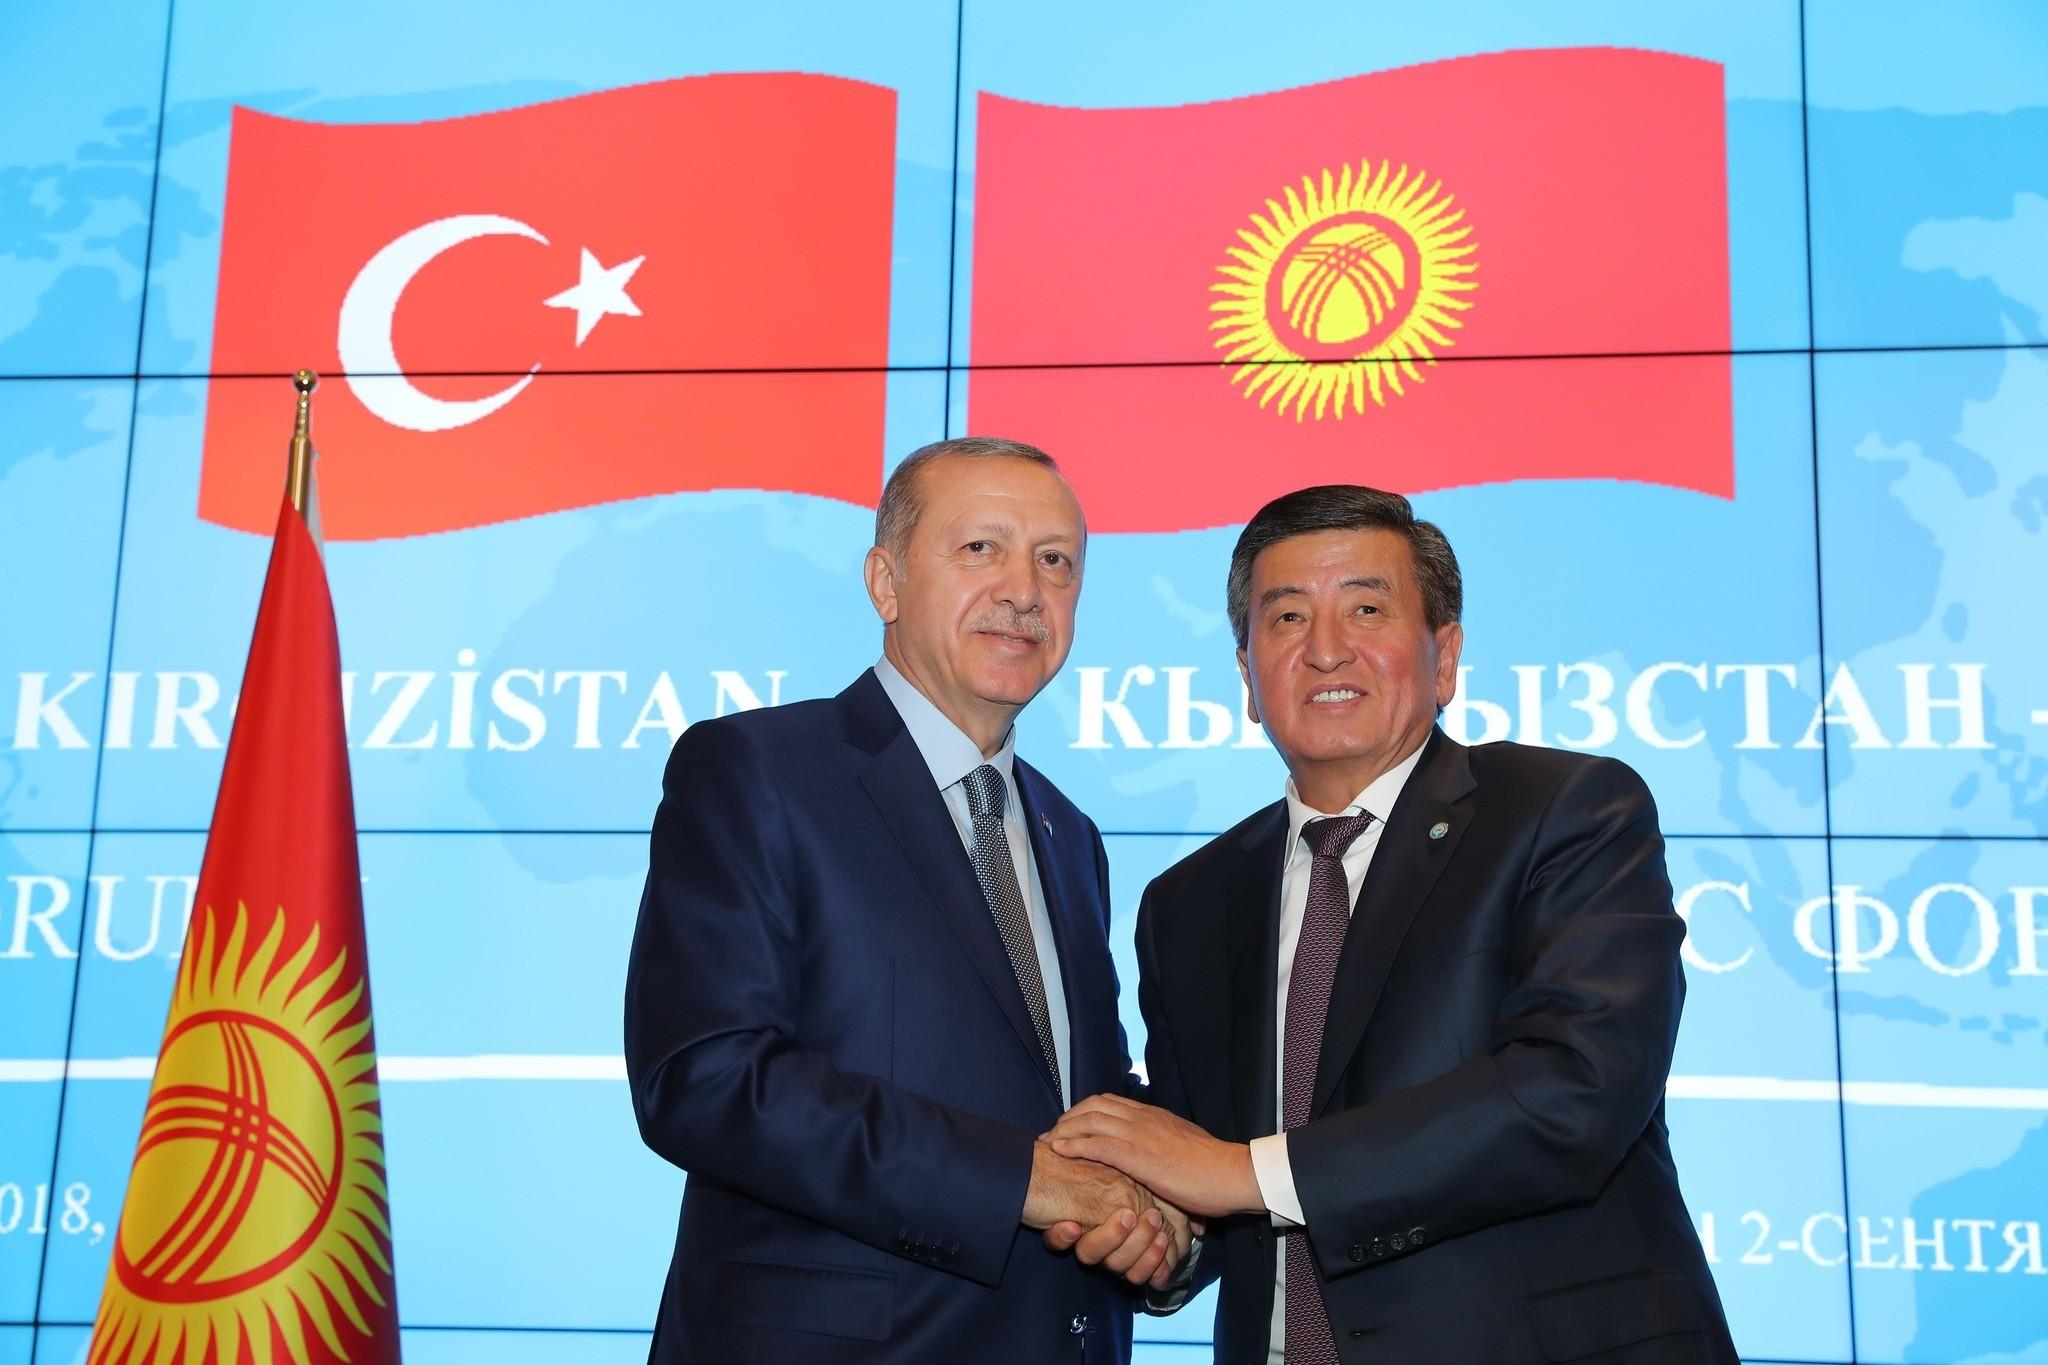 President Recep Tayyip Erdou011fan and Kyrgyzstanu2019s President Sooronbay Jeenbekov shake hands on the sidelines of the Turkey-Kyrgyzstan Business Forum in the Kyrgyz capital Bishkek, Sept. 2.